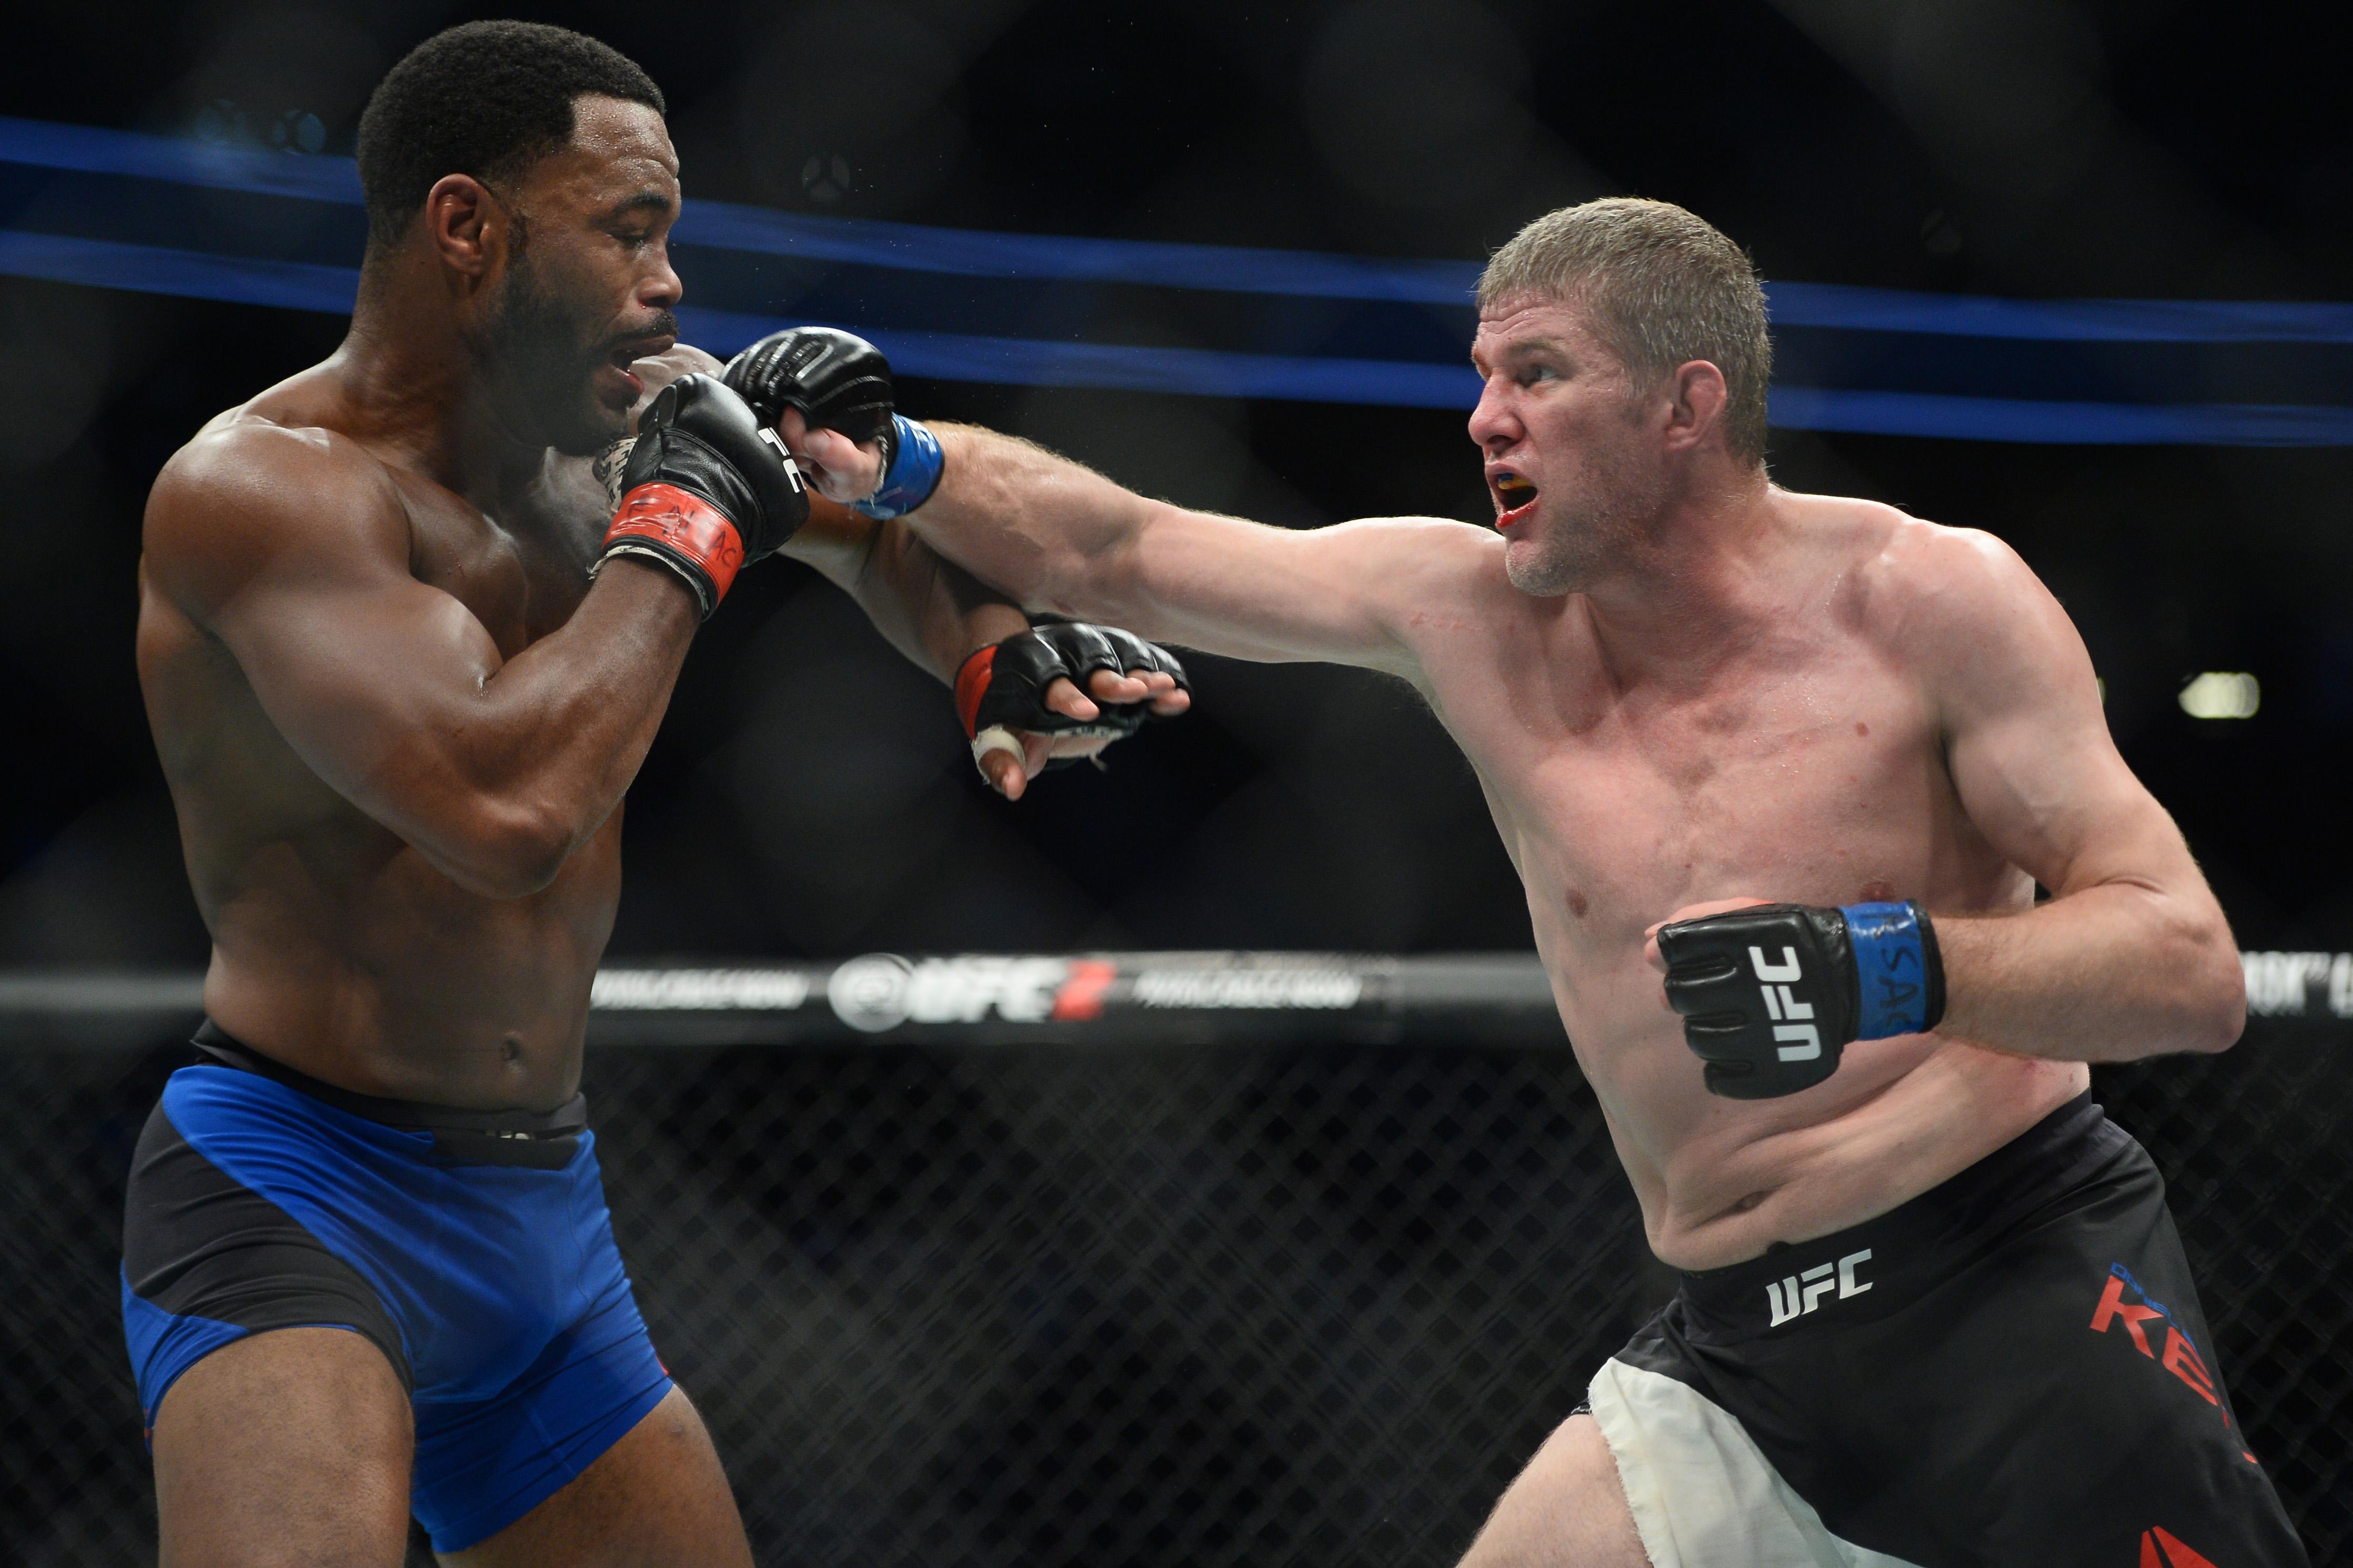 MMA: UFC 209-Evans vs Kelly